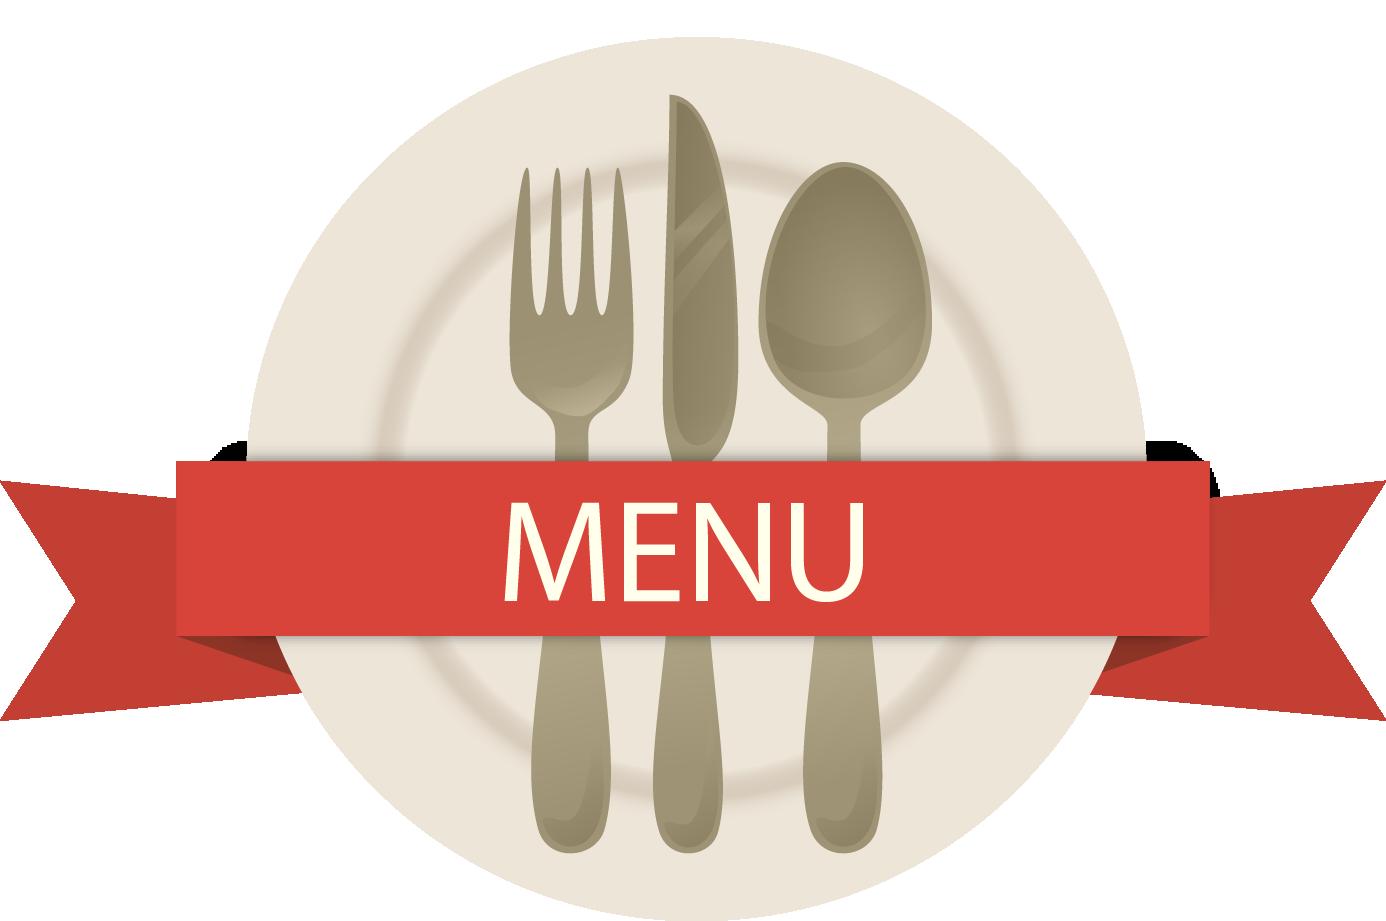 PNG Menu Restaurant - 44667